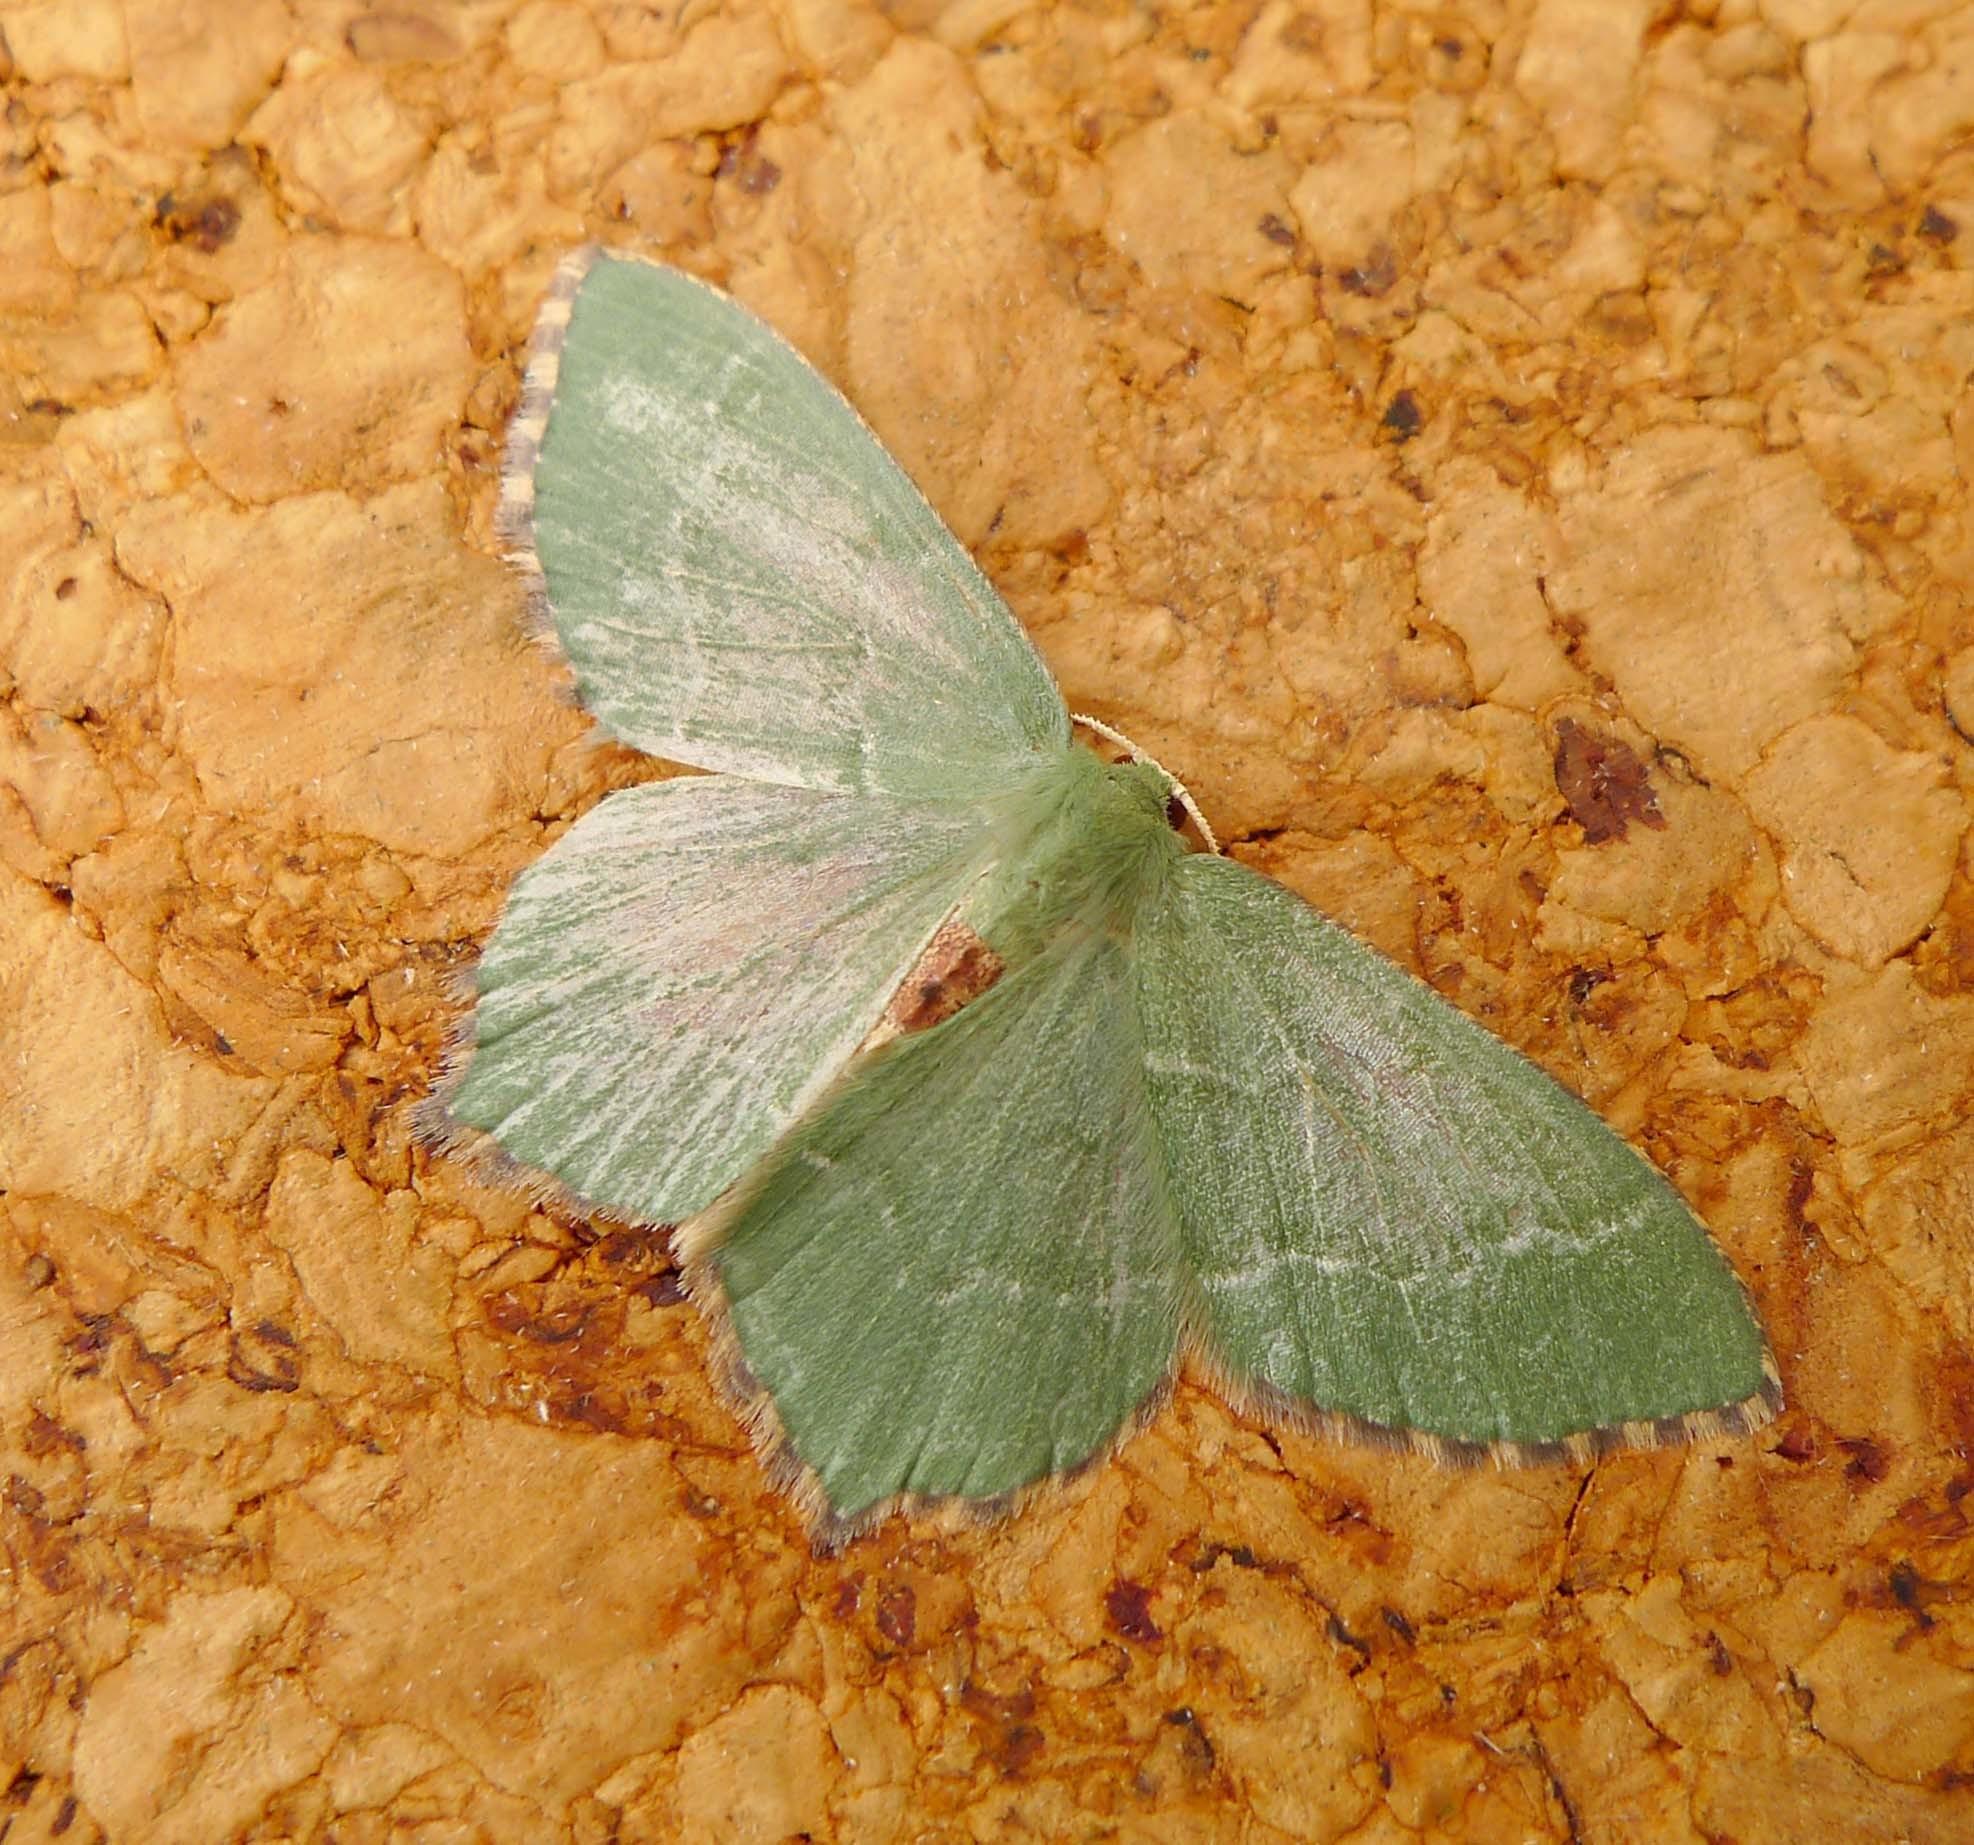 Image of Common Emerald